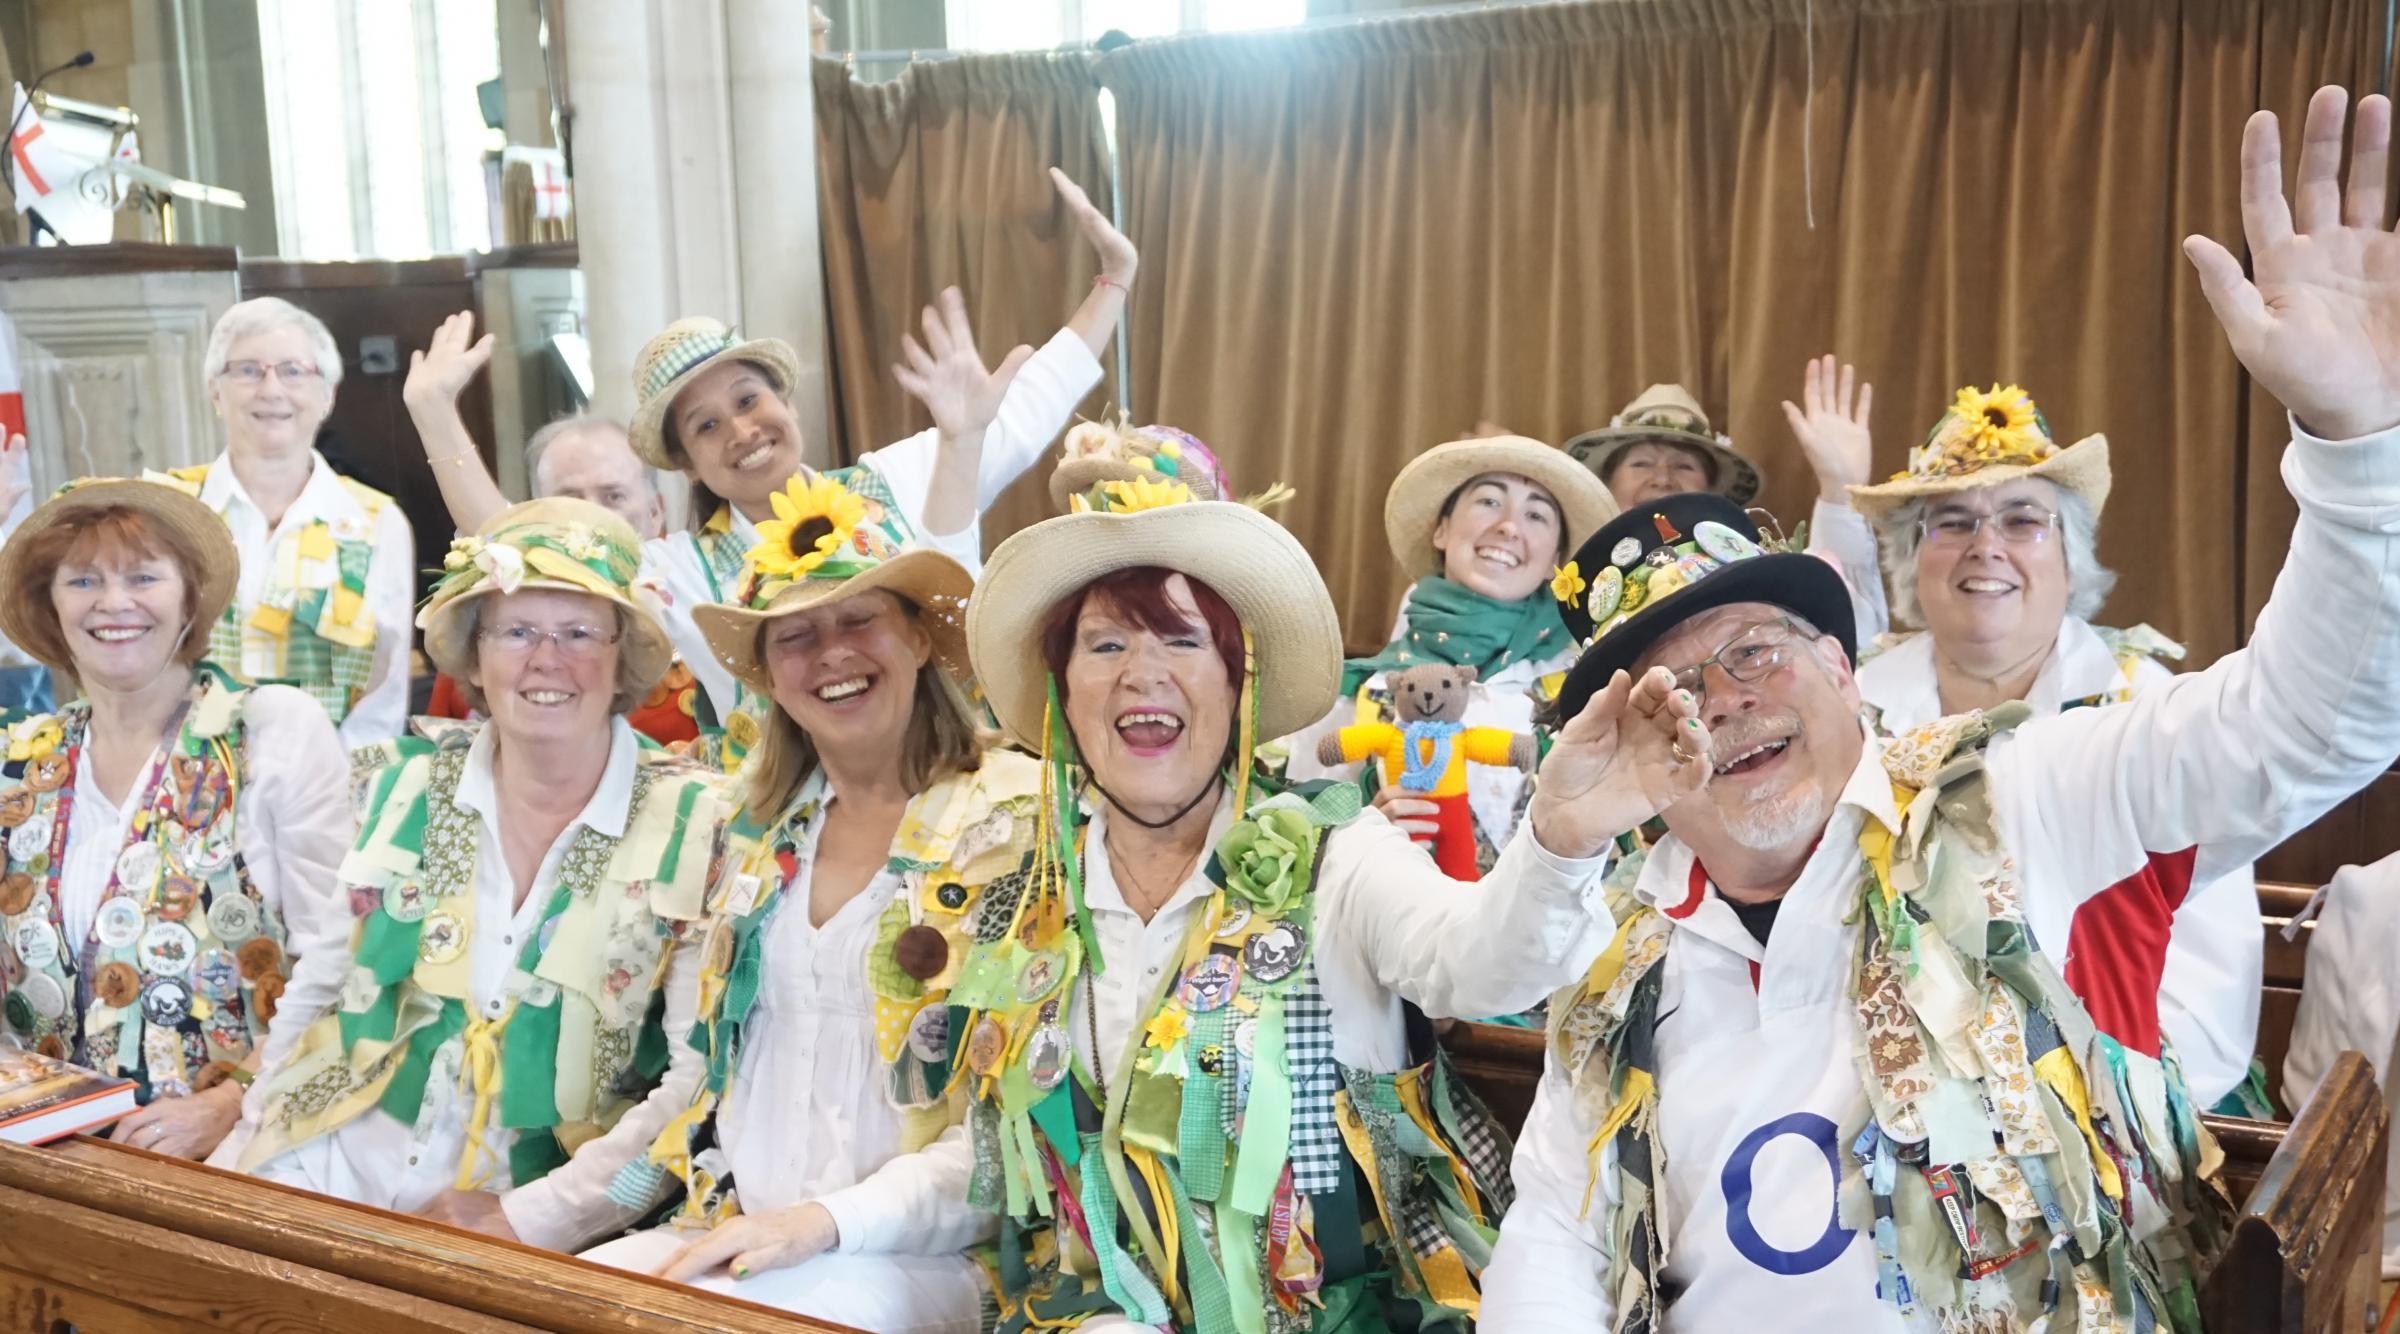 £3k boost for St George's Church in Fordington following success of annual fair